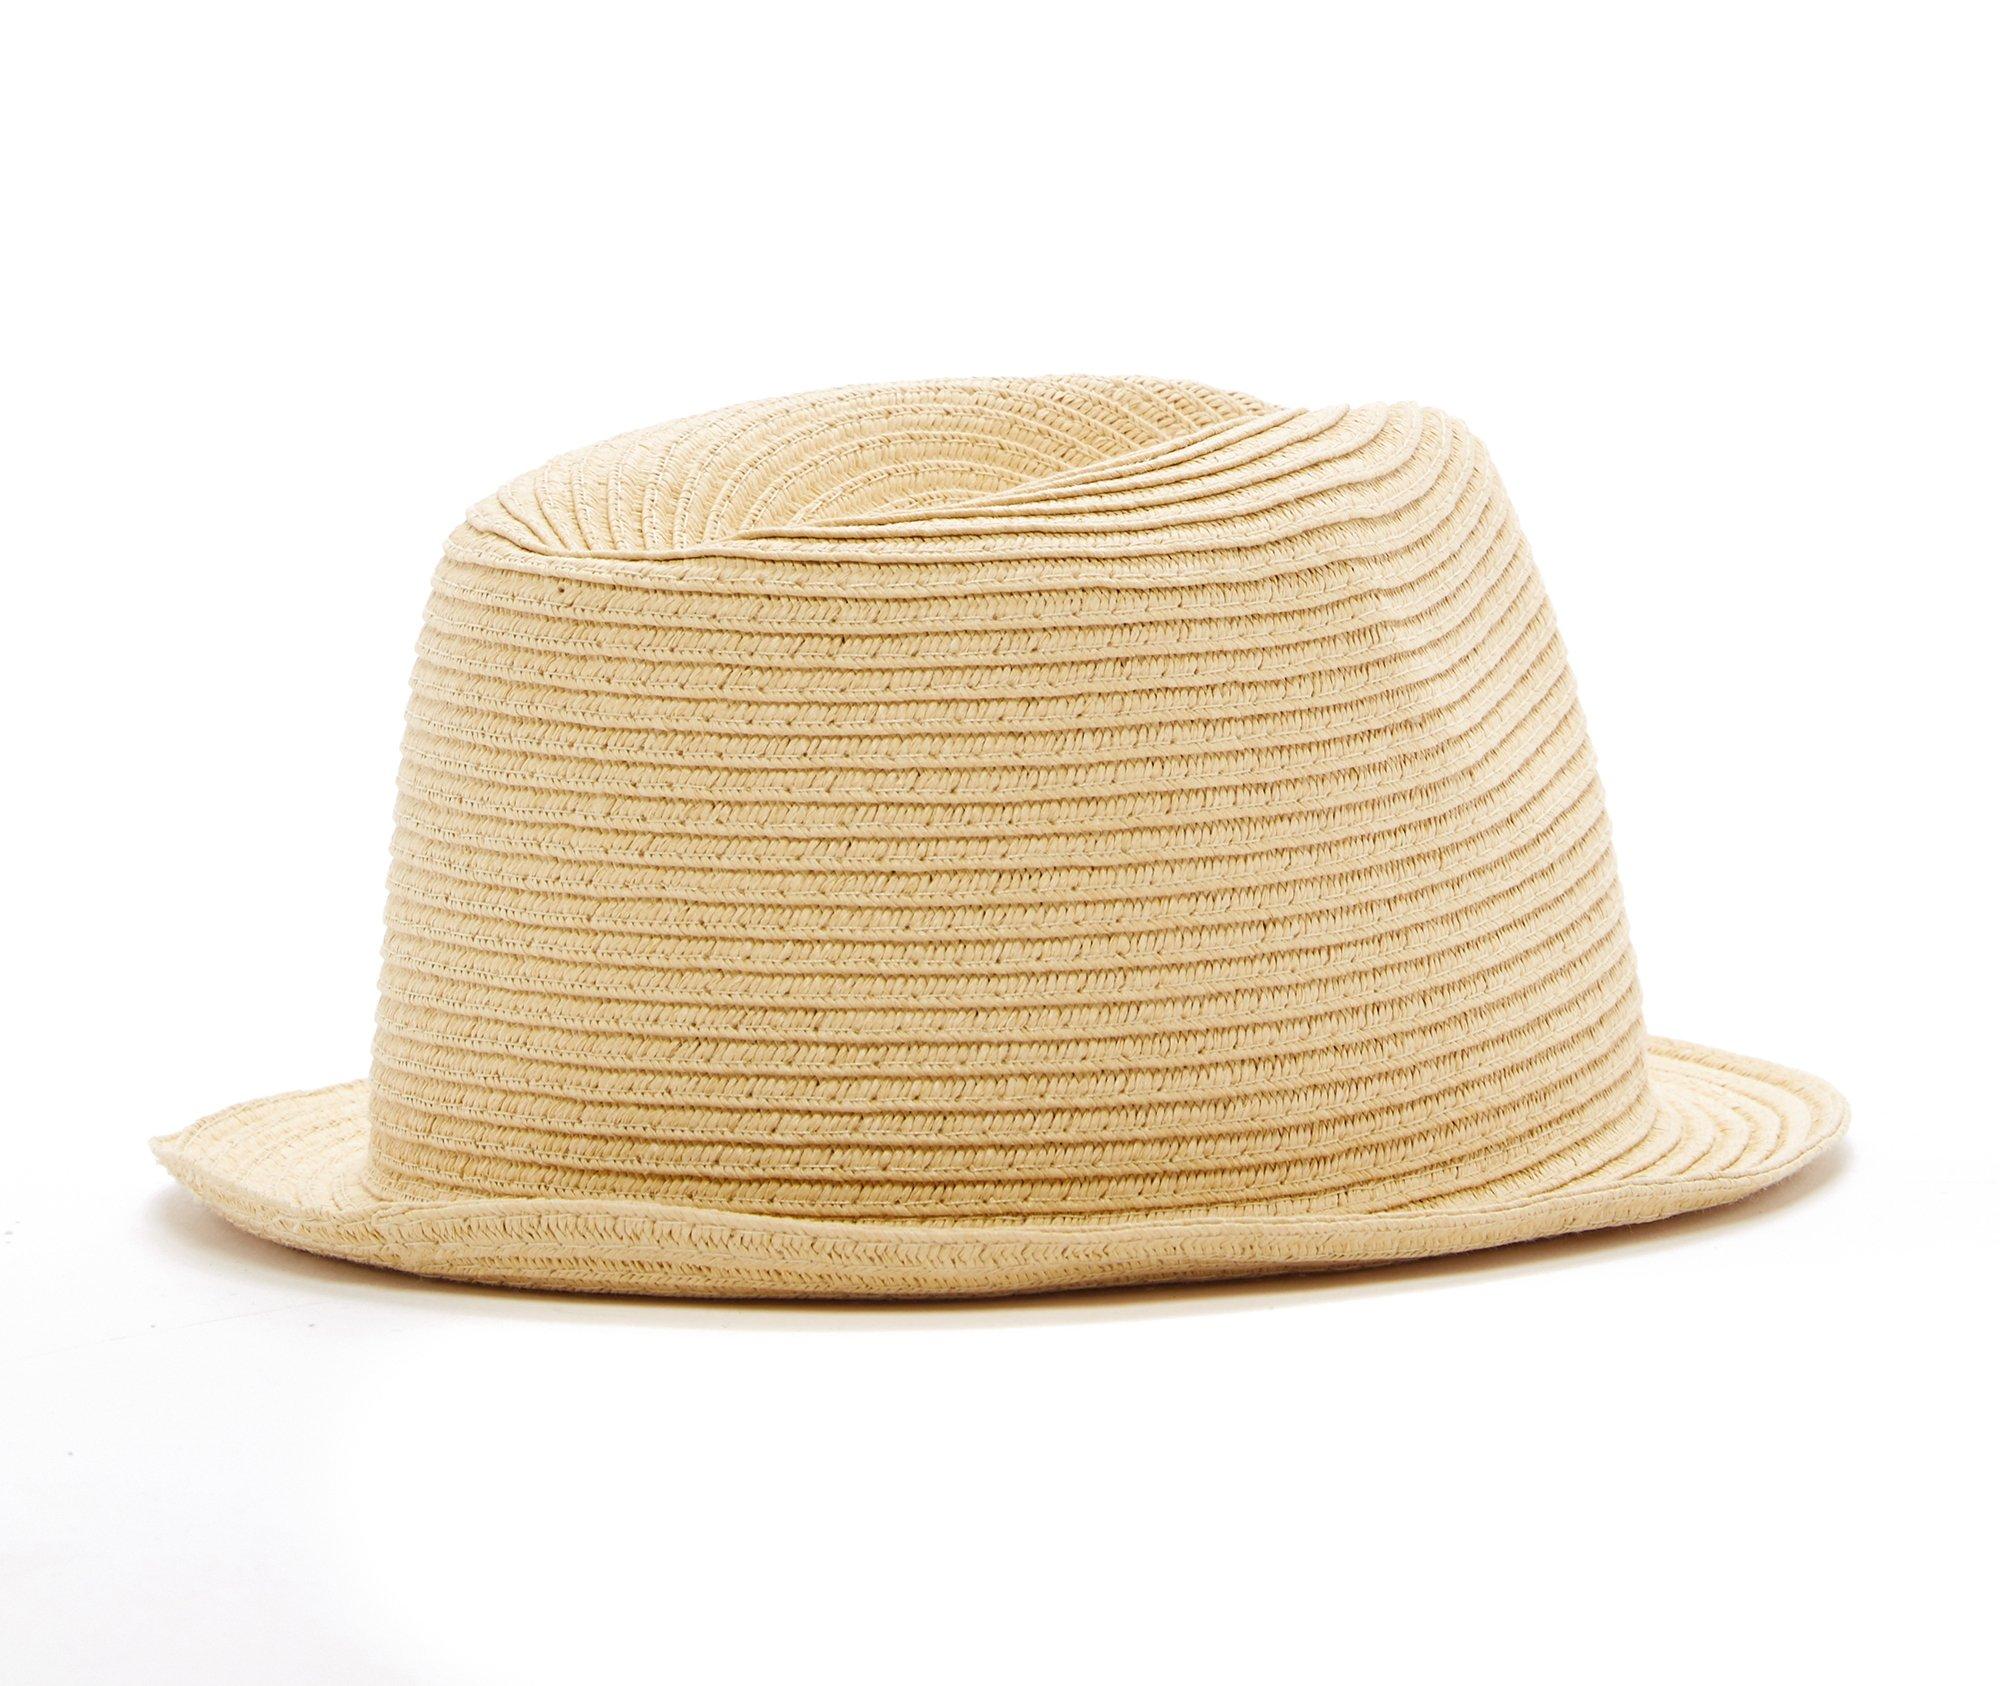 Born to Love Infant/Toddler Boy's Fedora Hat (S (12-24 Months), Light Straw)